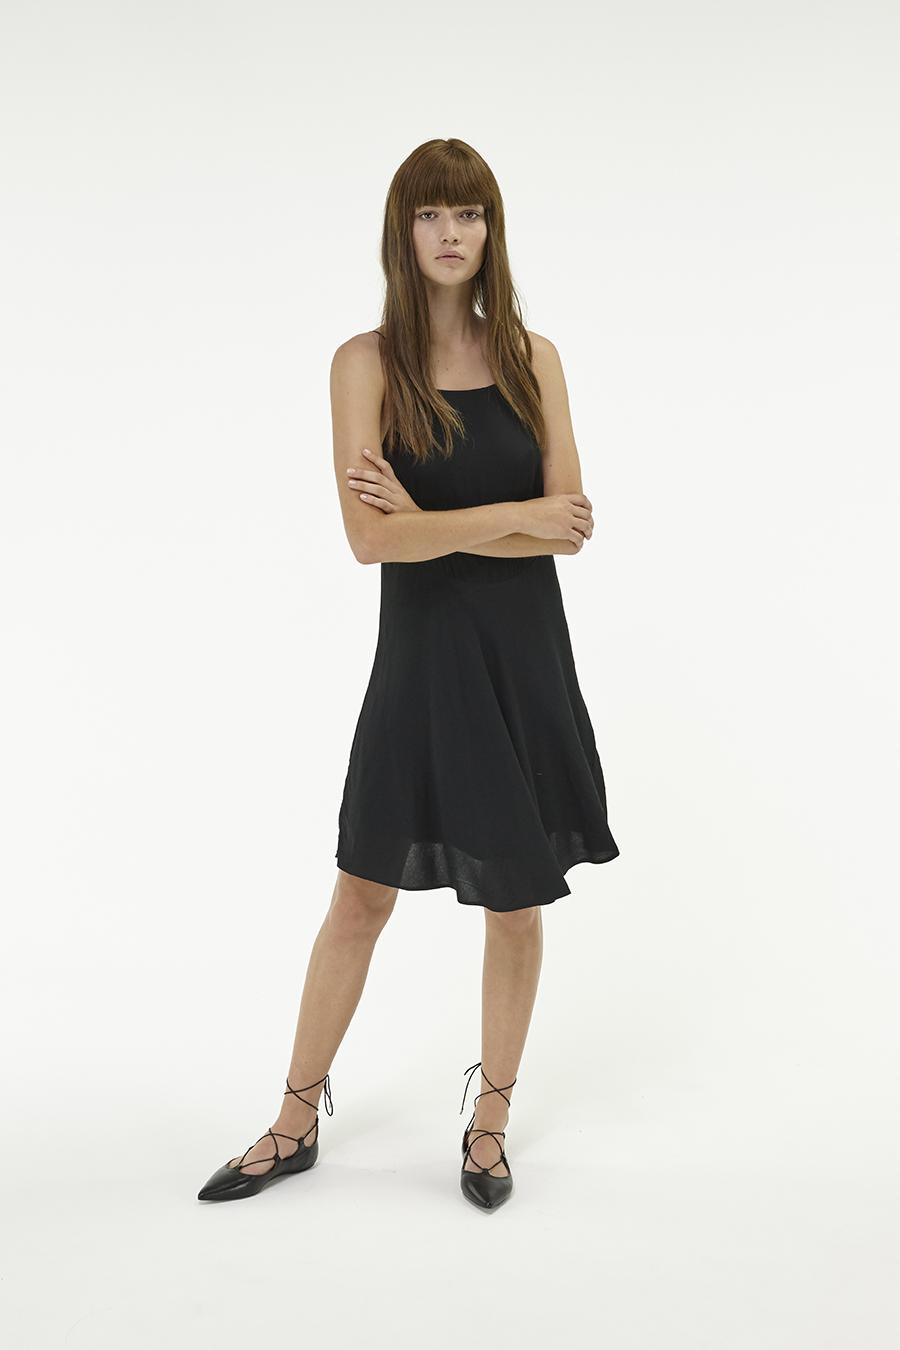 Huffer_Q3-16_W-Halle-Dress_Black-04